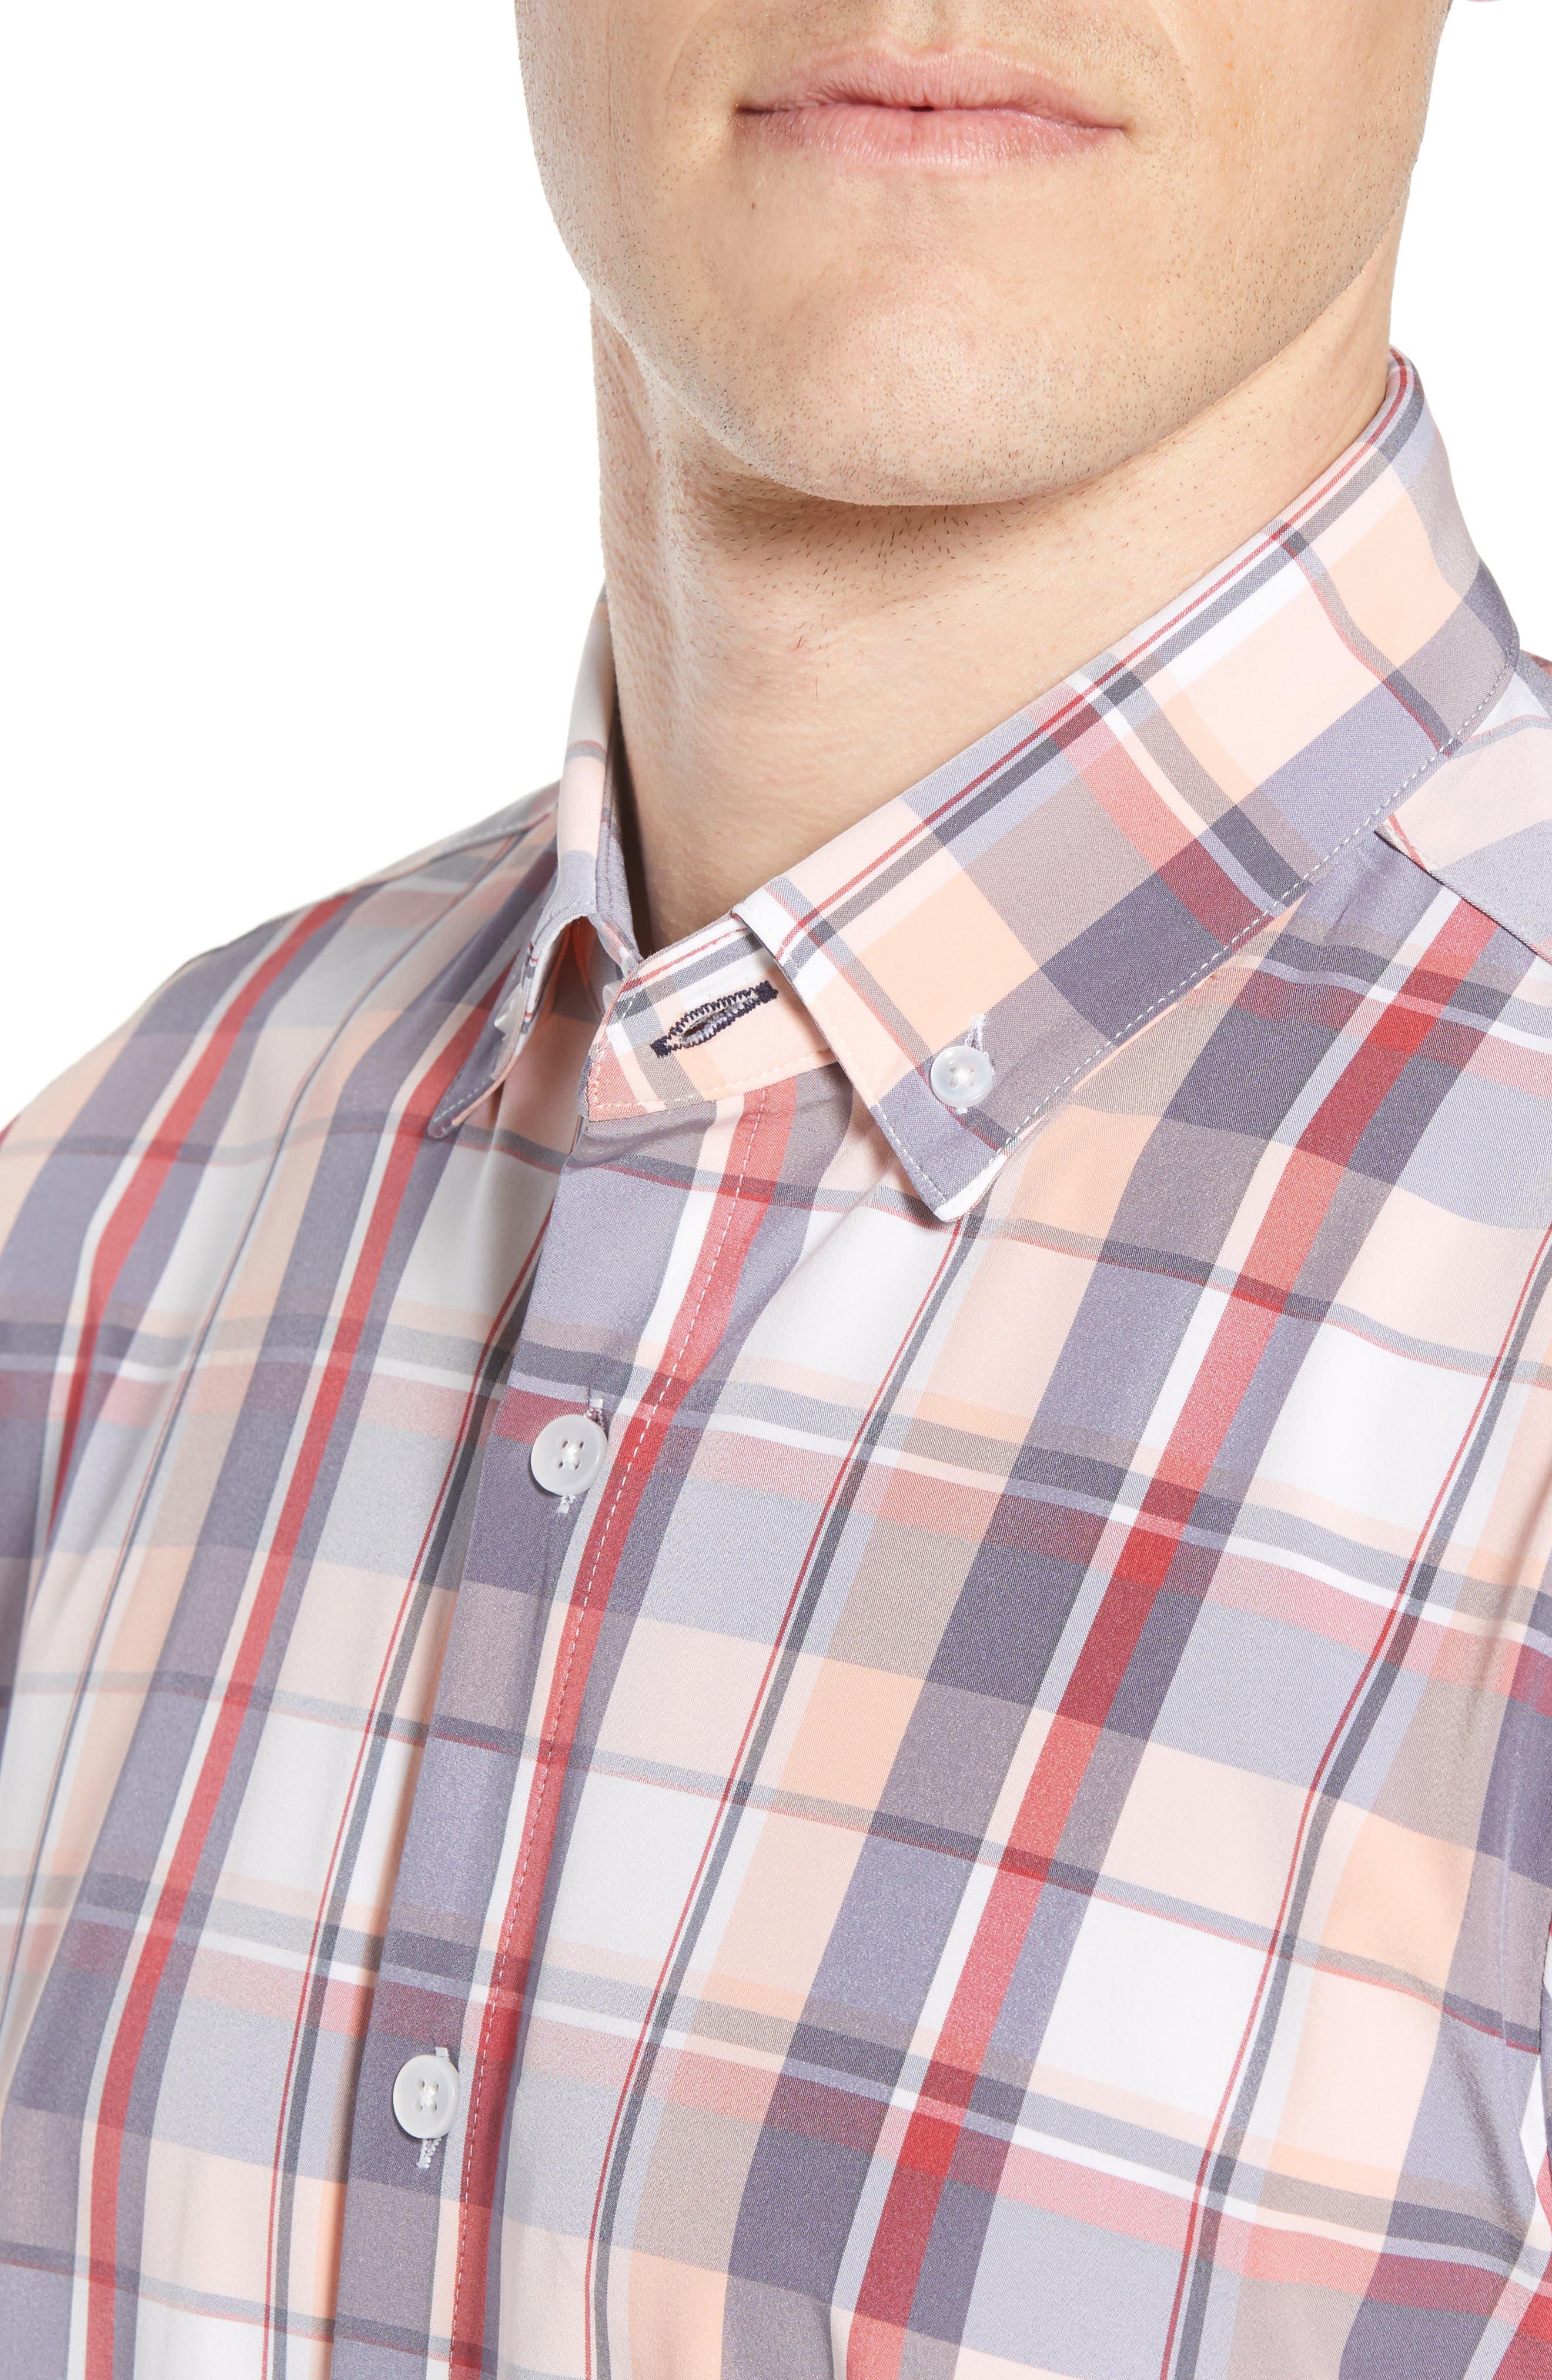 Brazos Slim Fit Madras Plaid Performance Sport Shirt,                             Alternate thumbnail 4, color,                             PEACH